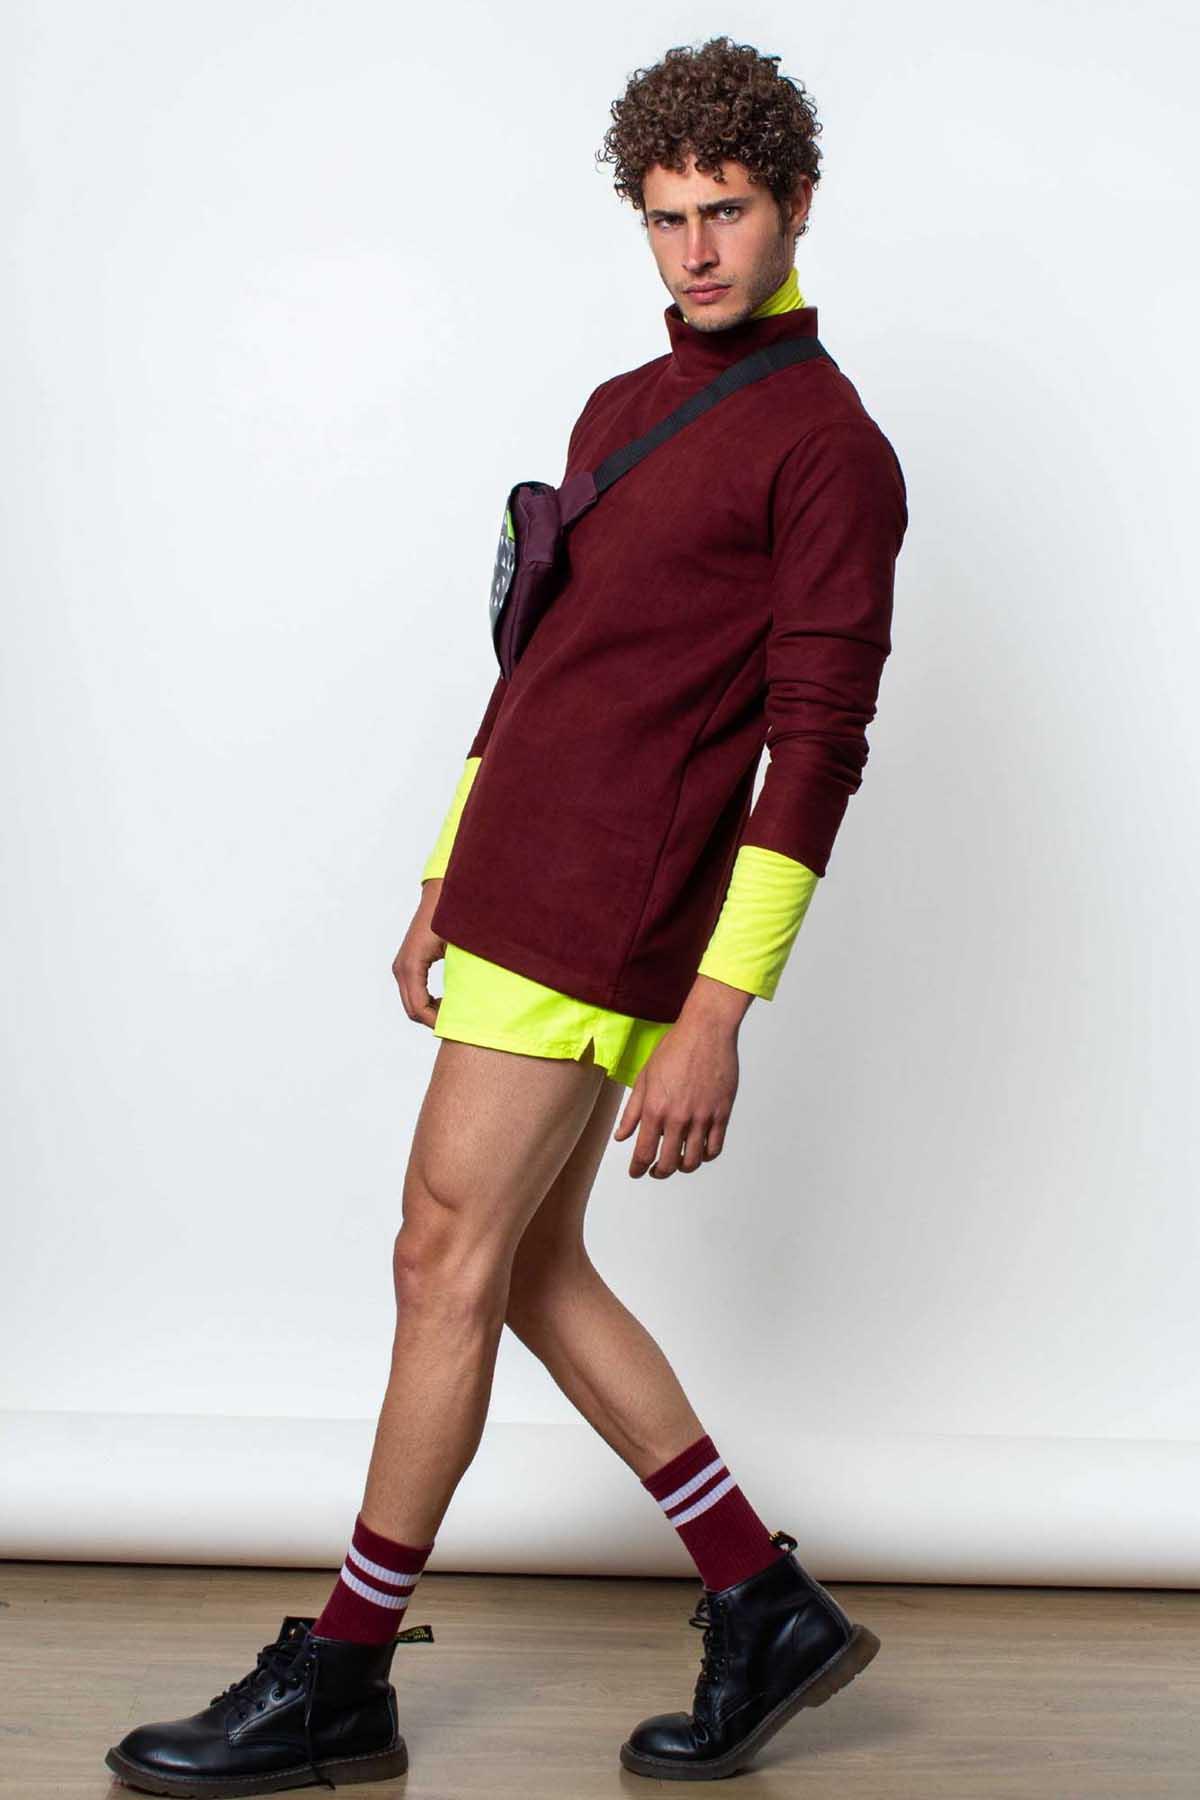 Kaian Bentlin by Jonathan Chirinos for Brazilian Male Model